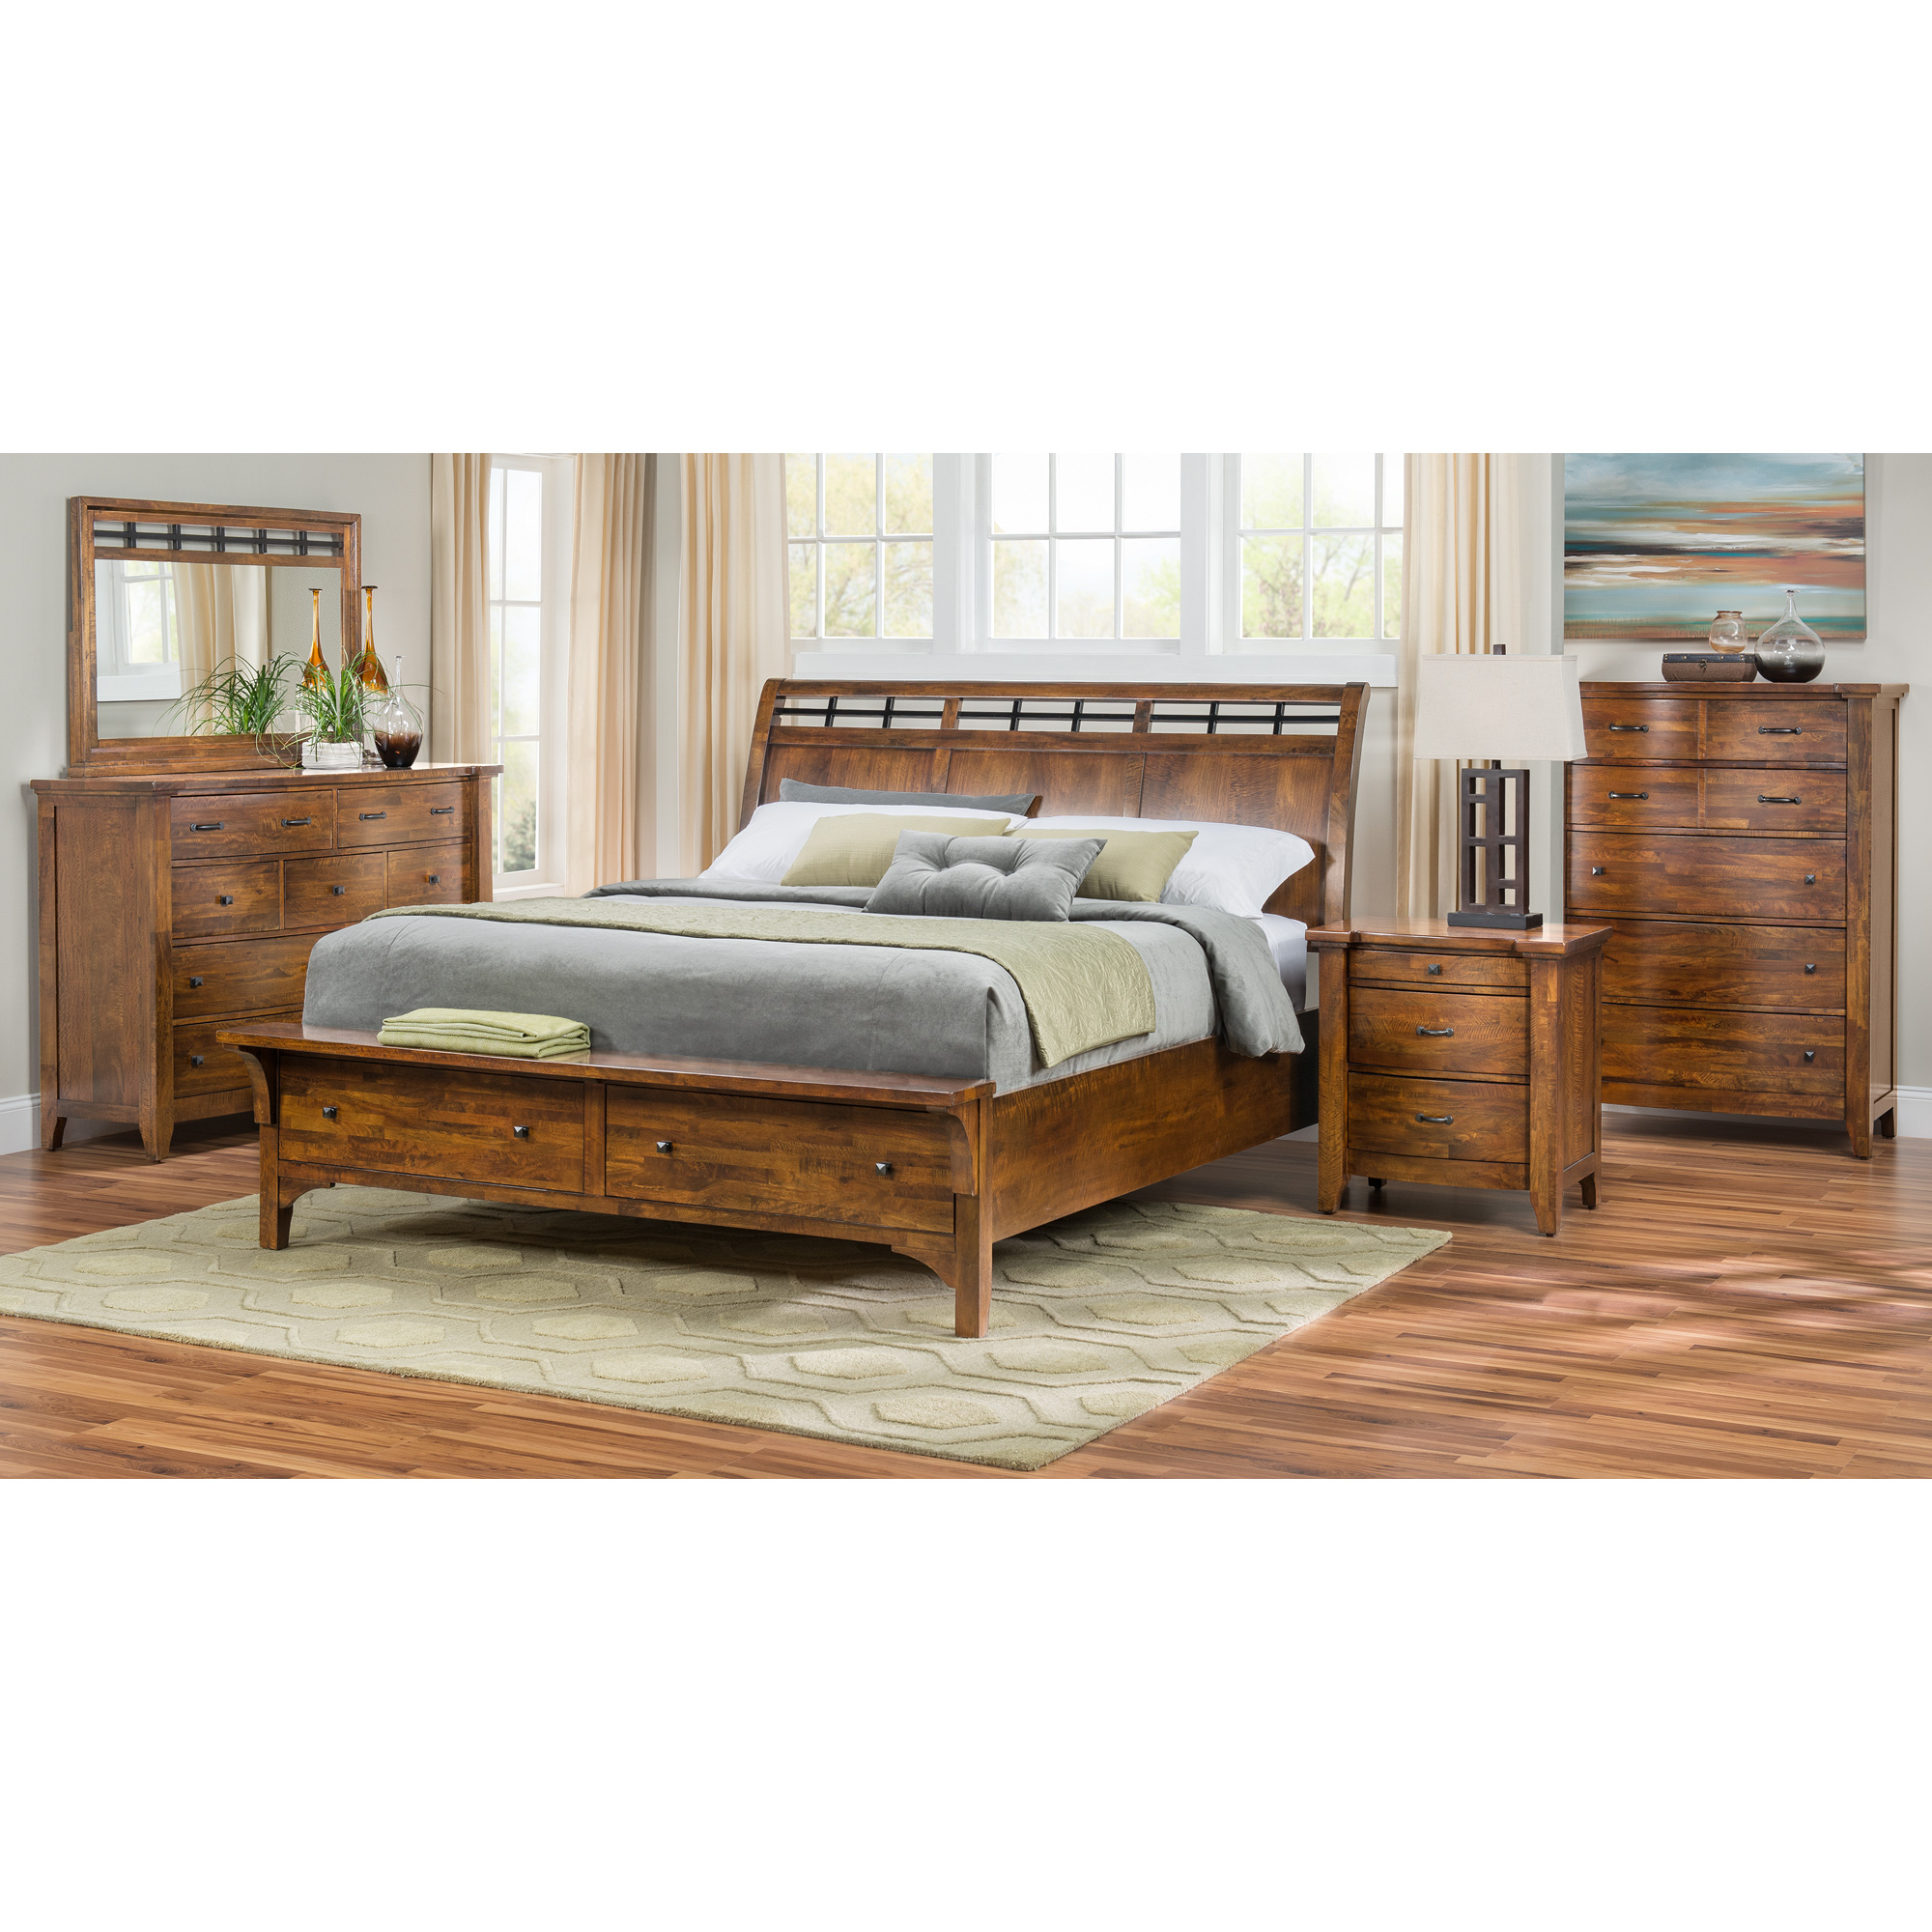 Napa Furniture   Whistler Retreat Dark Walnut California King Storage 4 Piece Room Group Bedroom Set